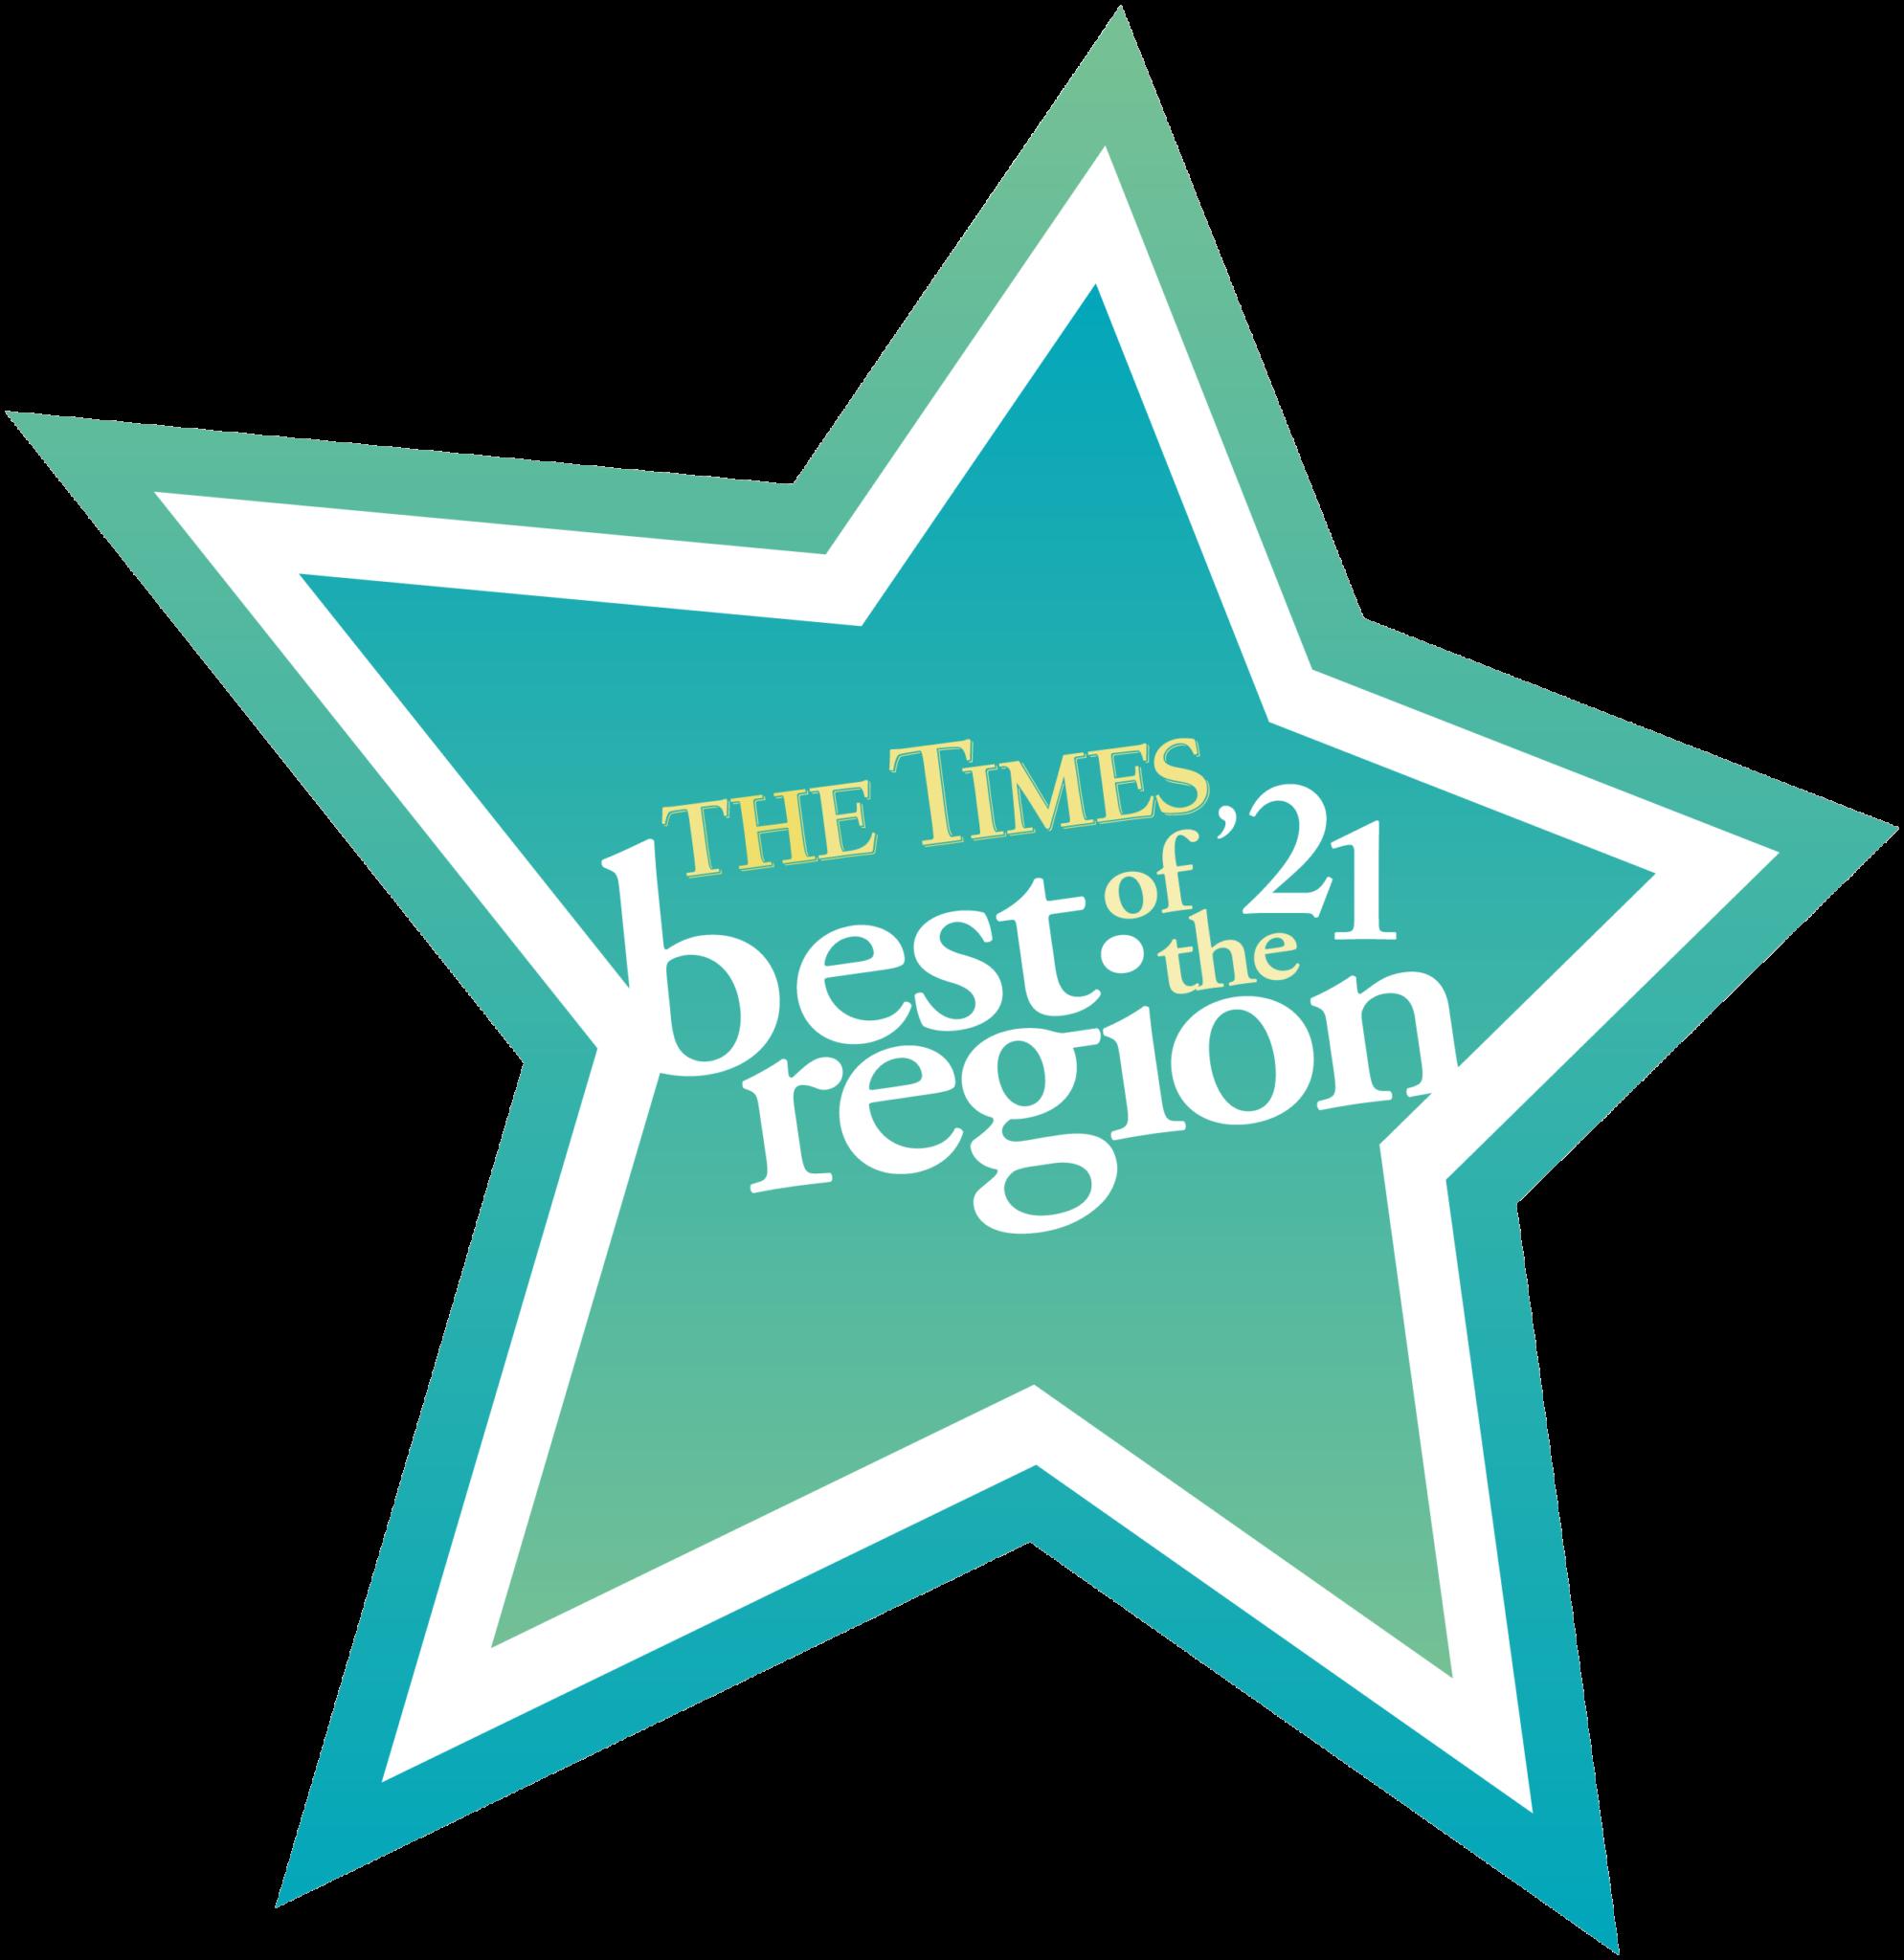 BestOf2021_Star_logo